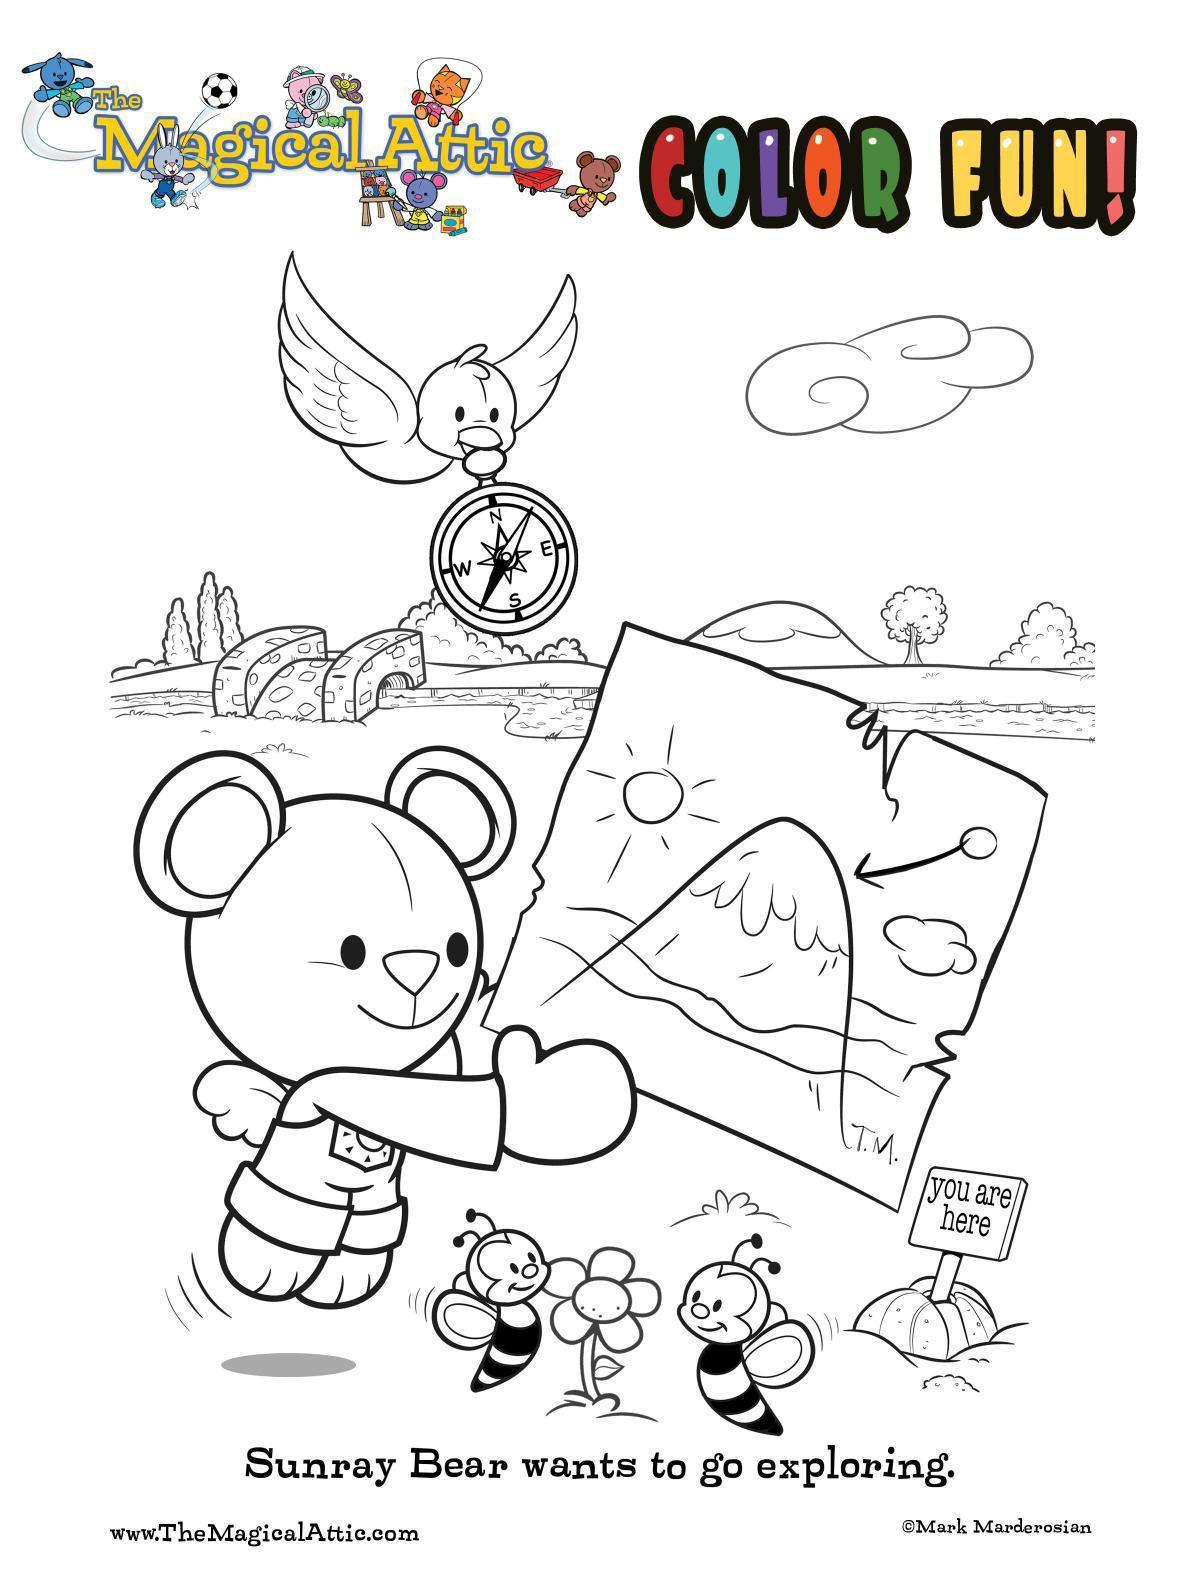 Exploring coloring fun with Sunray Bear